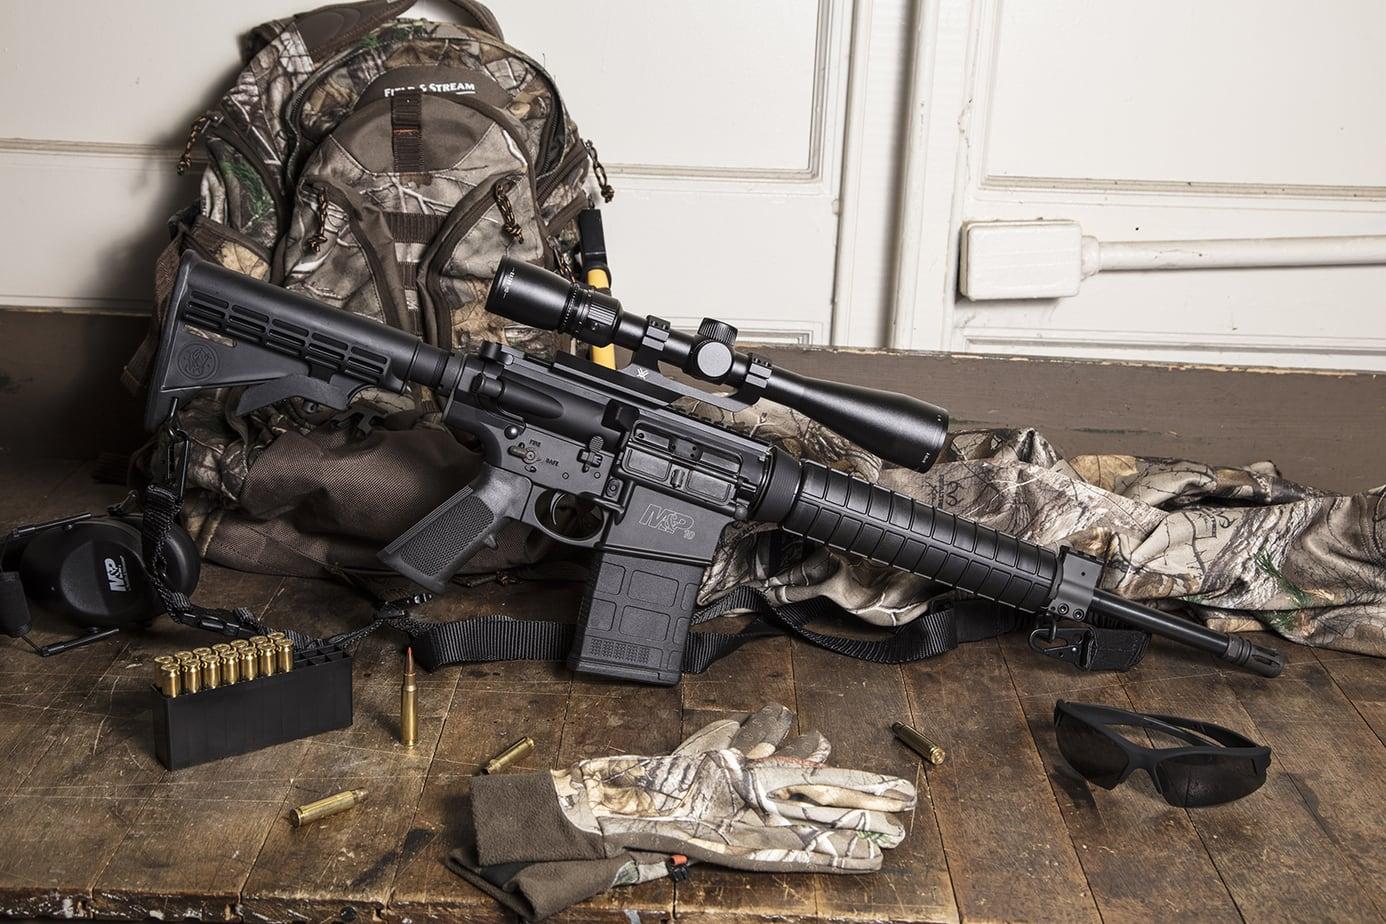 Smith & Wesson's M&P10: